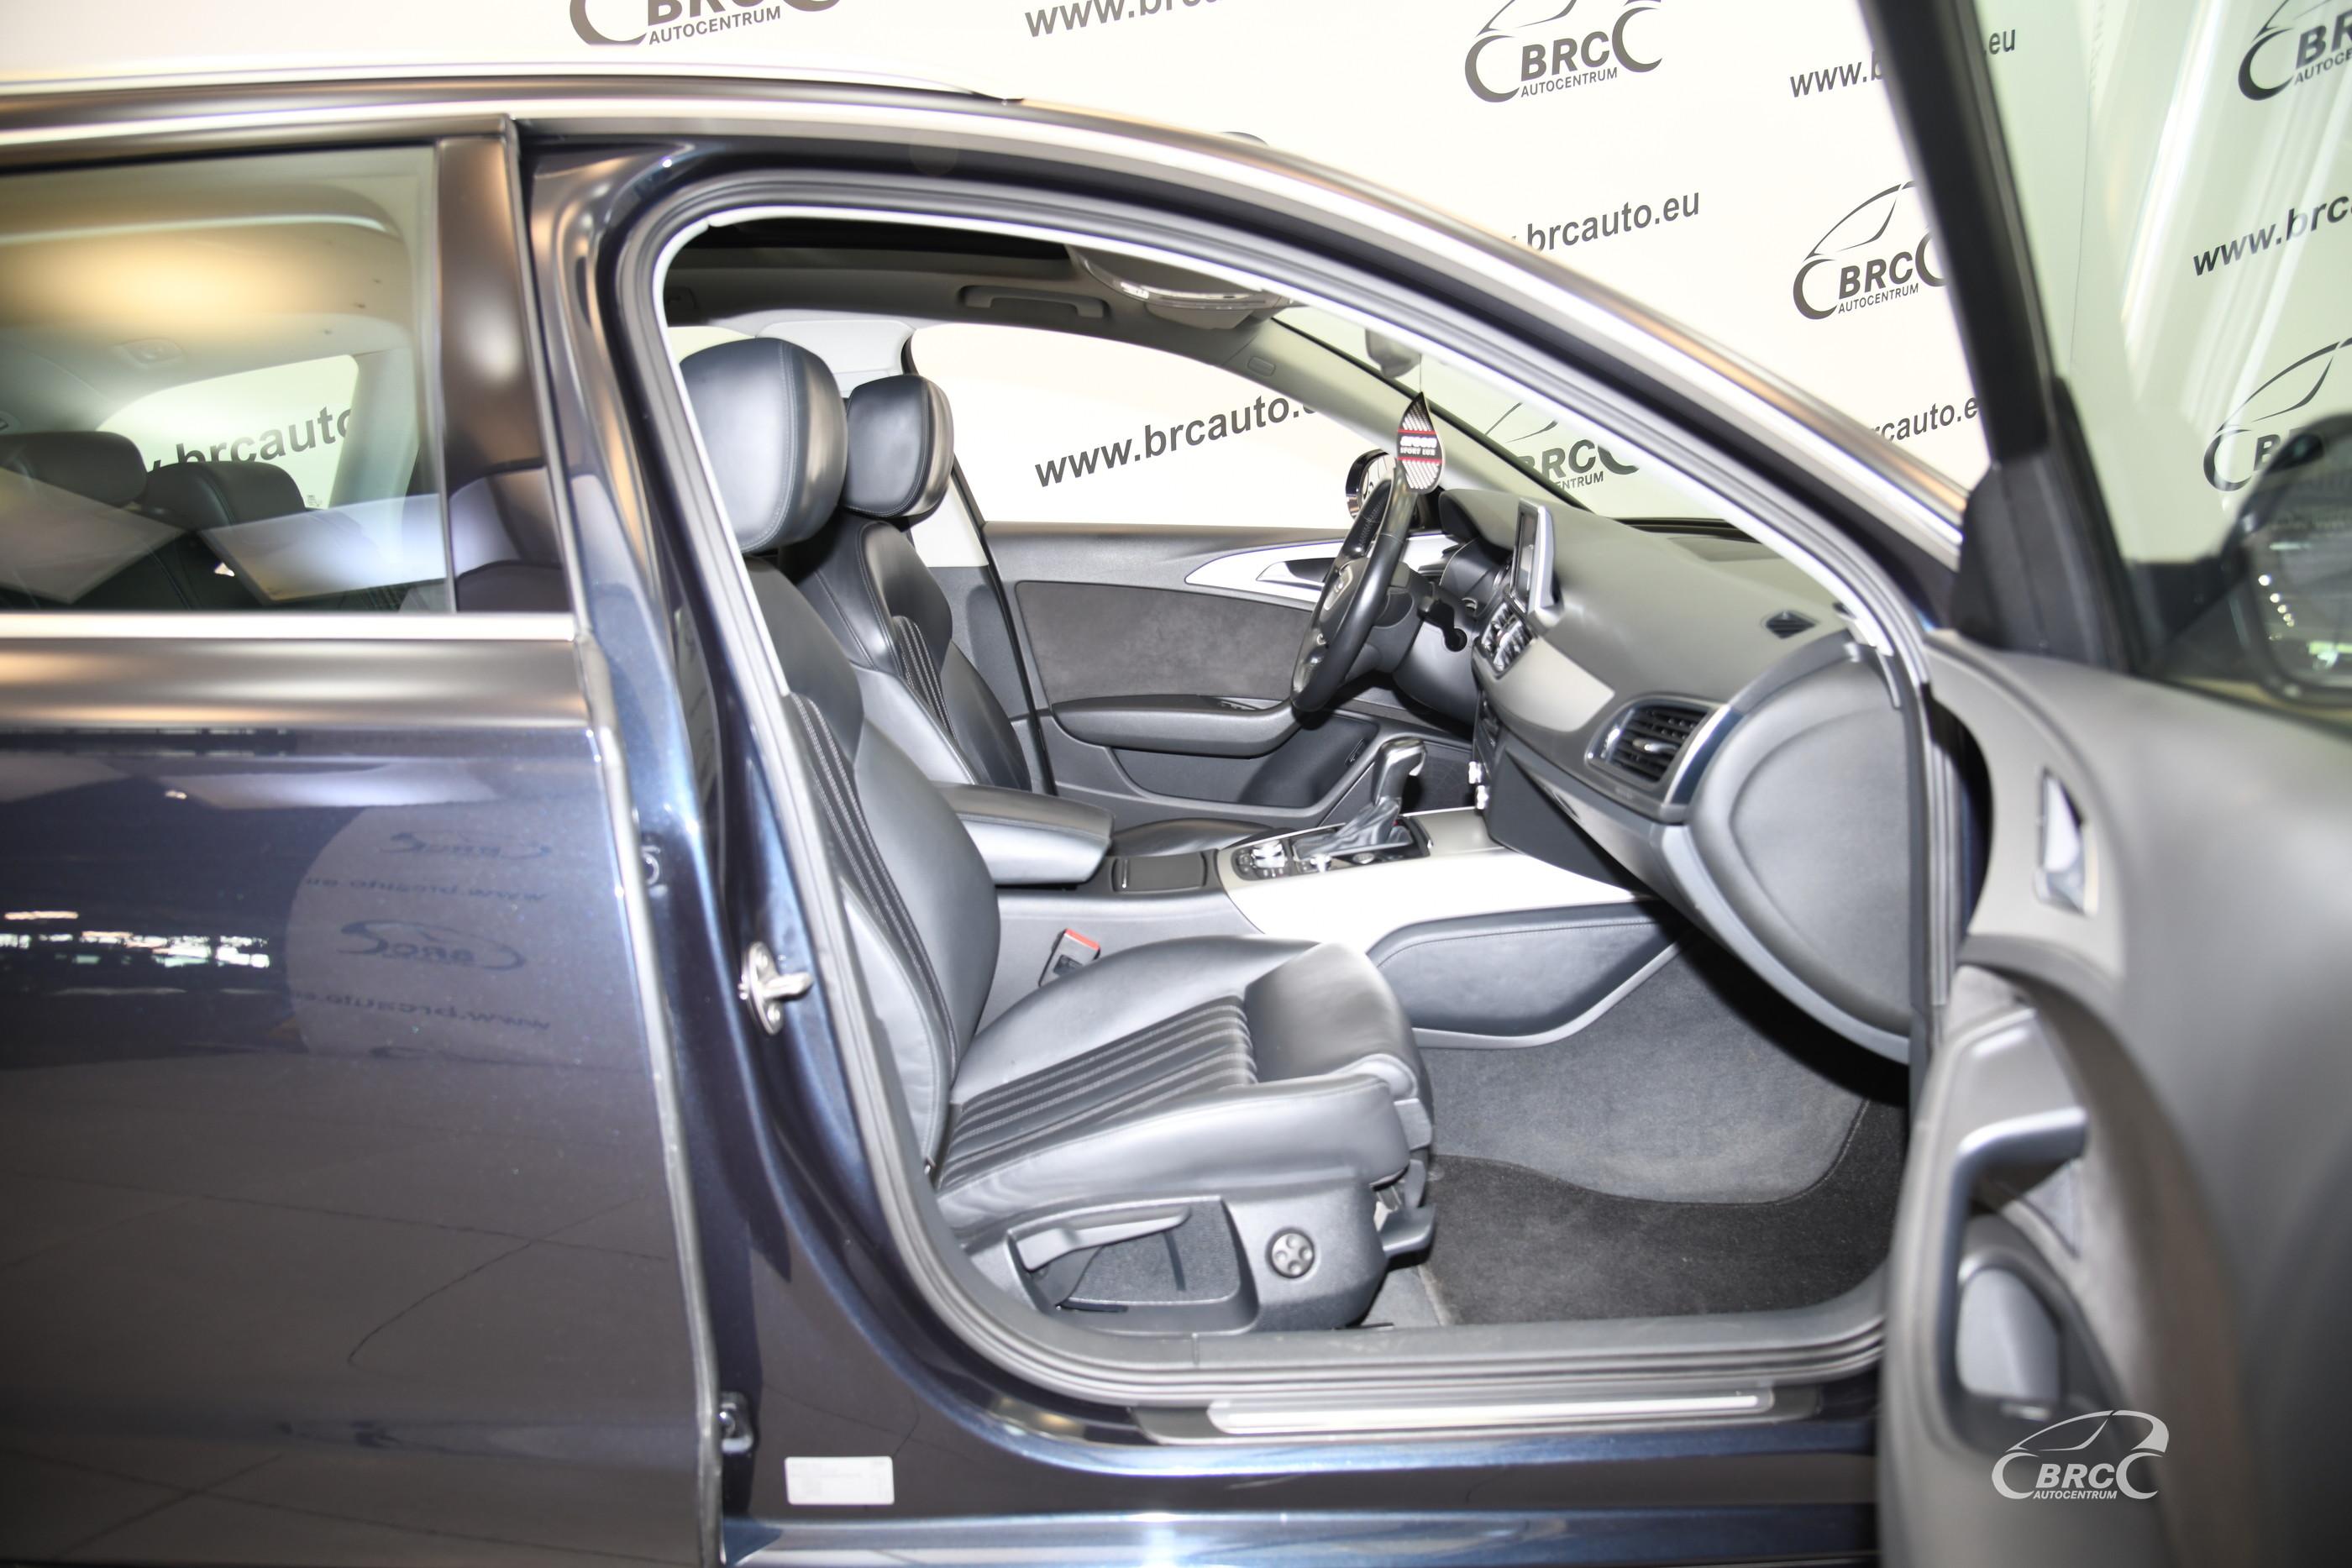 Audi A6 2.0 TDI Avant Automatas